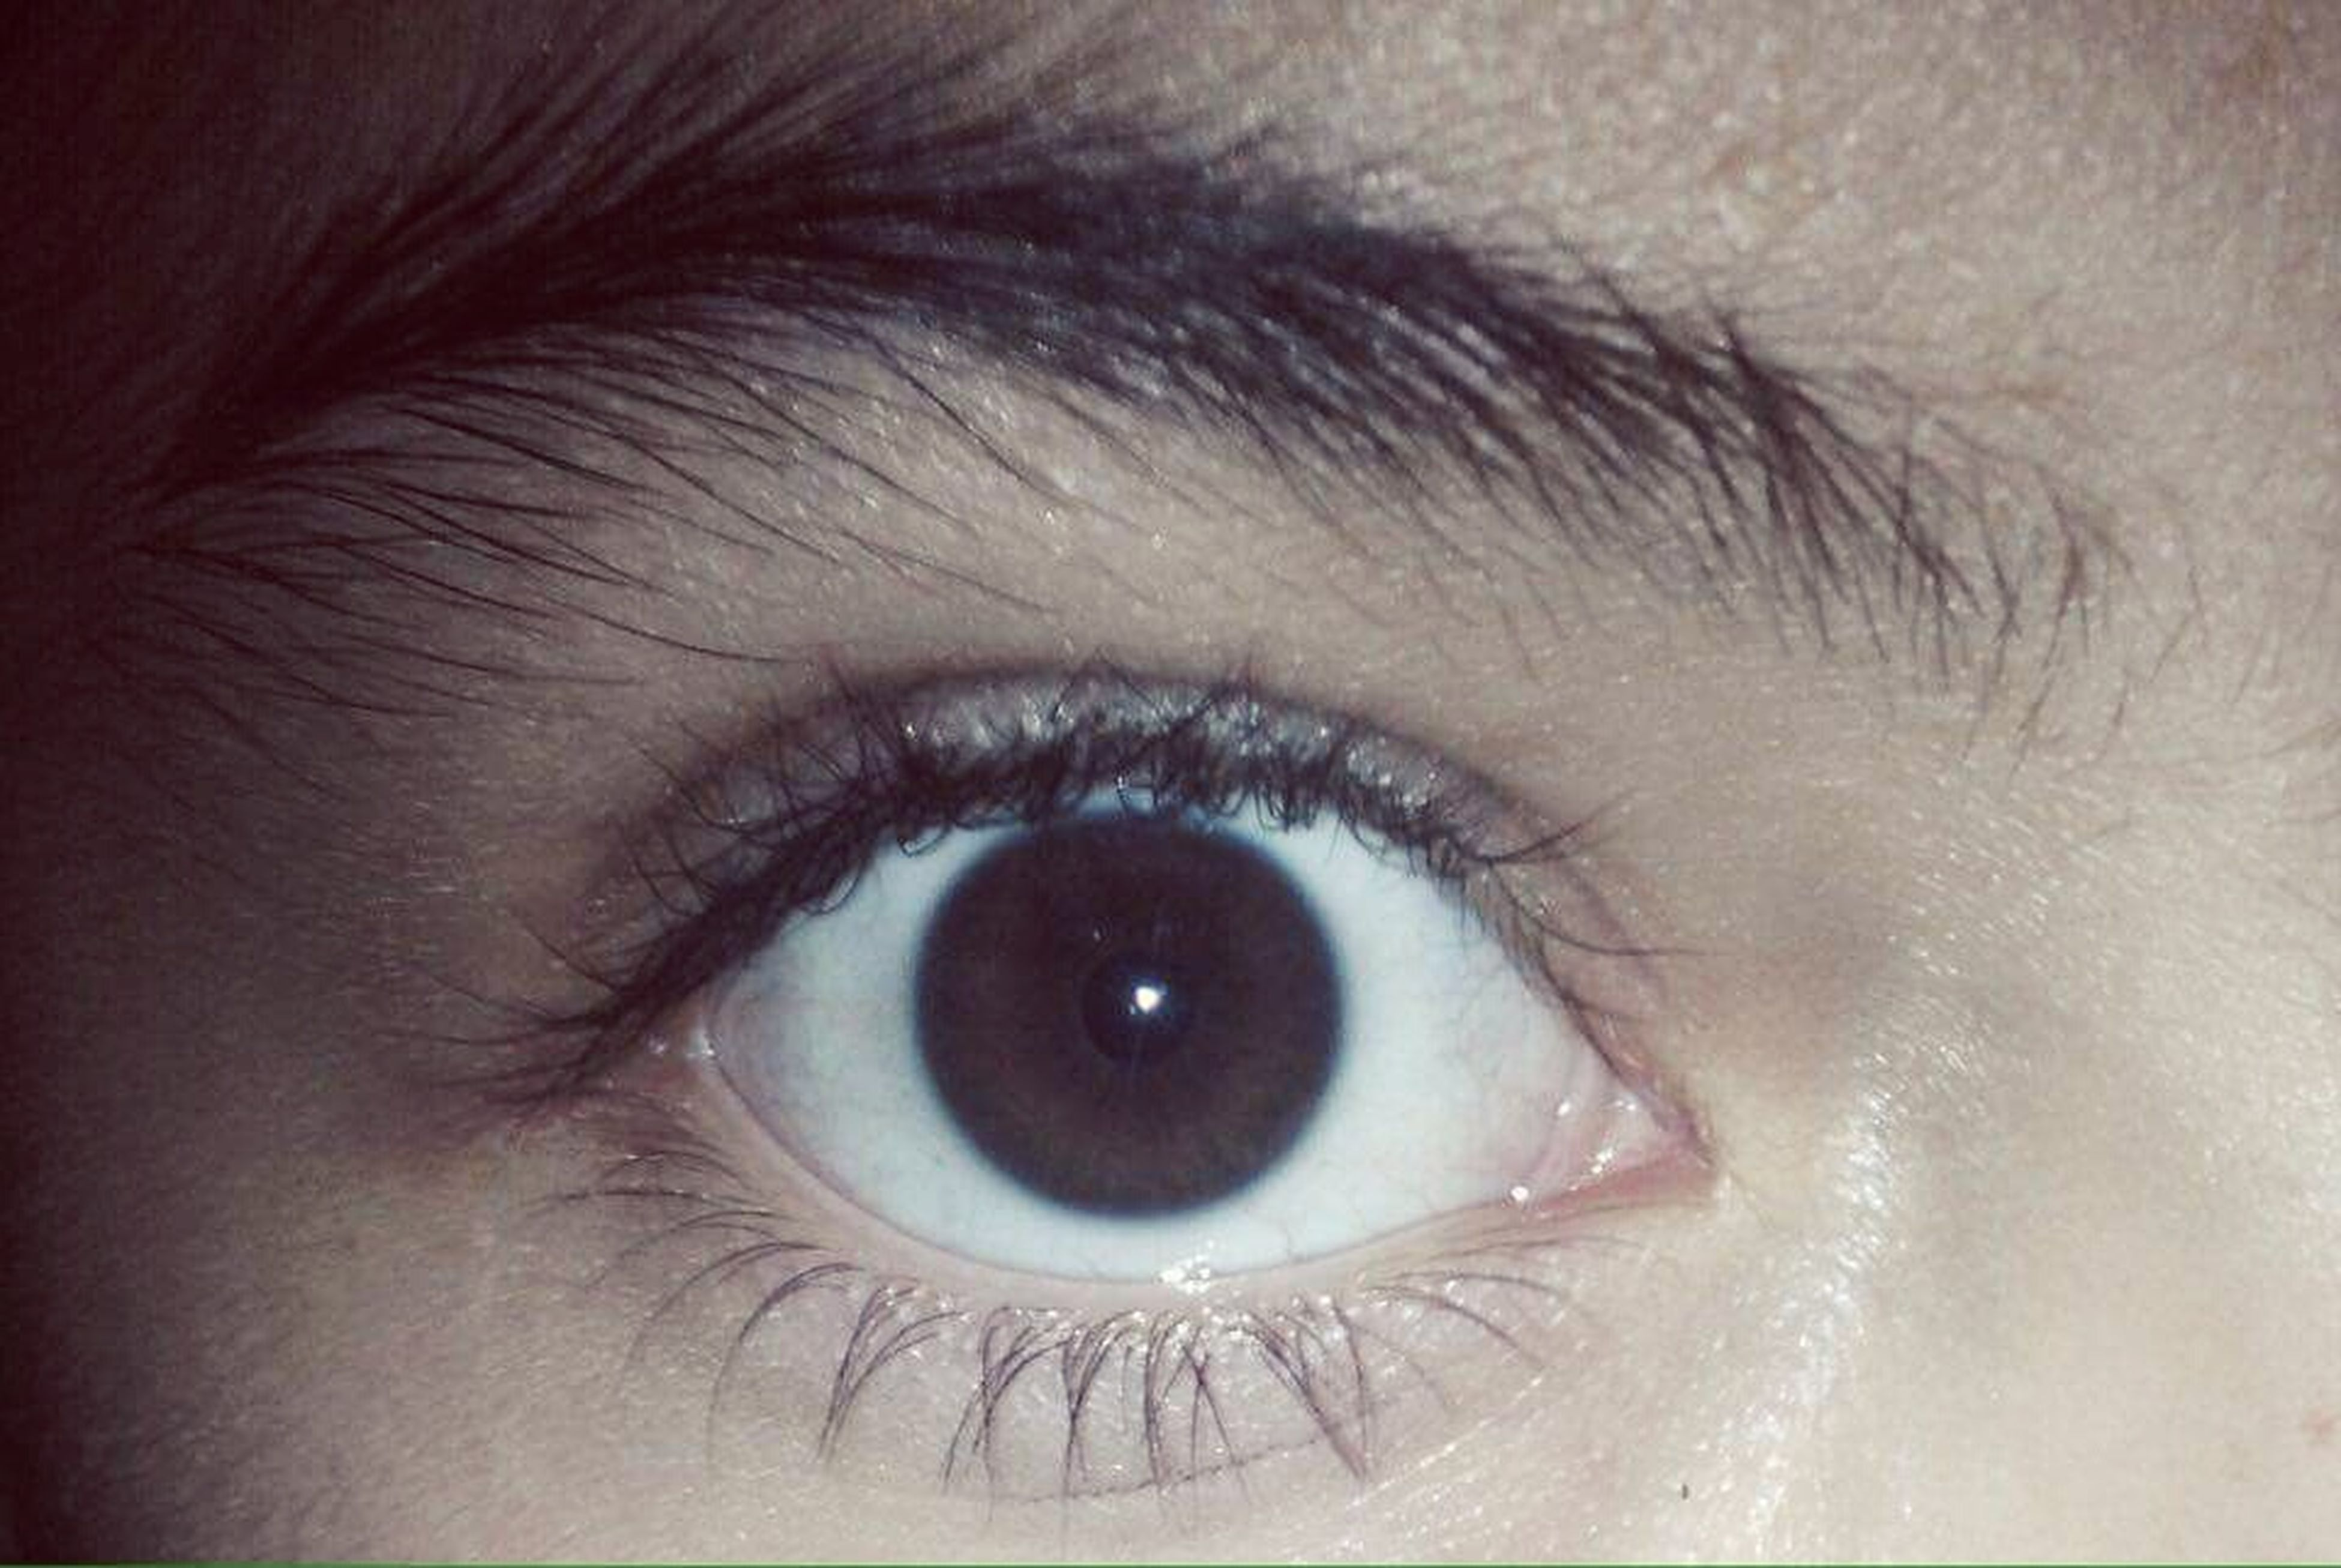 human eye, eyesight, human body part, eyelash, real people, close-up, sensory perception, human skin, one person, eyebrow, eyelid, eyeball, iris - eye, backgrounds, indoors, vision, day, people